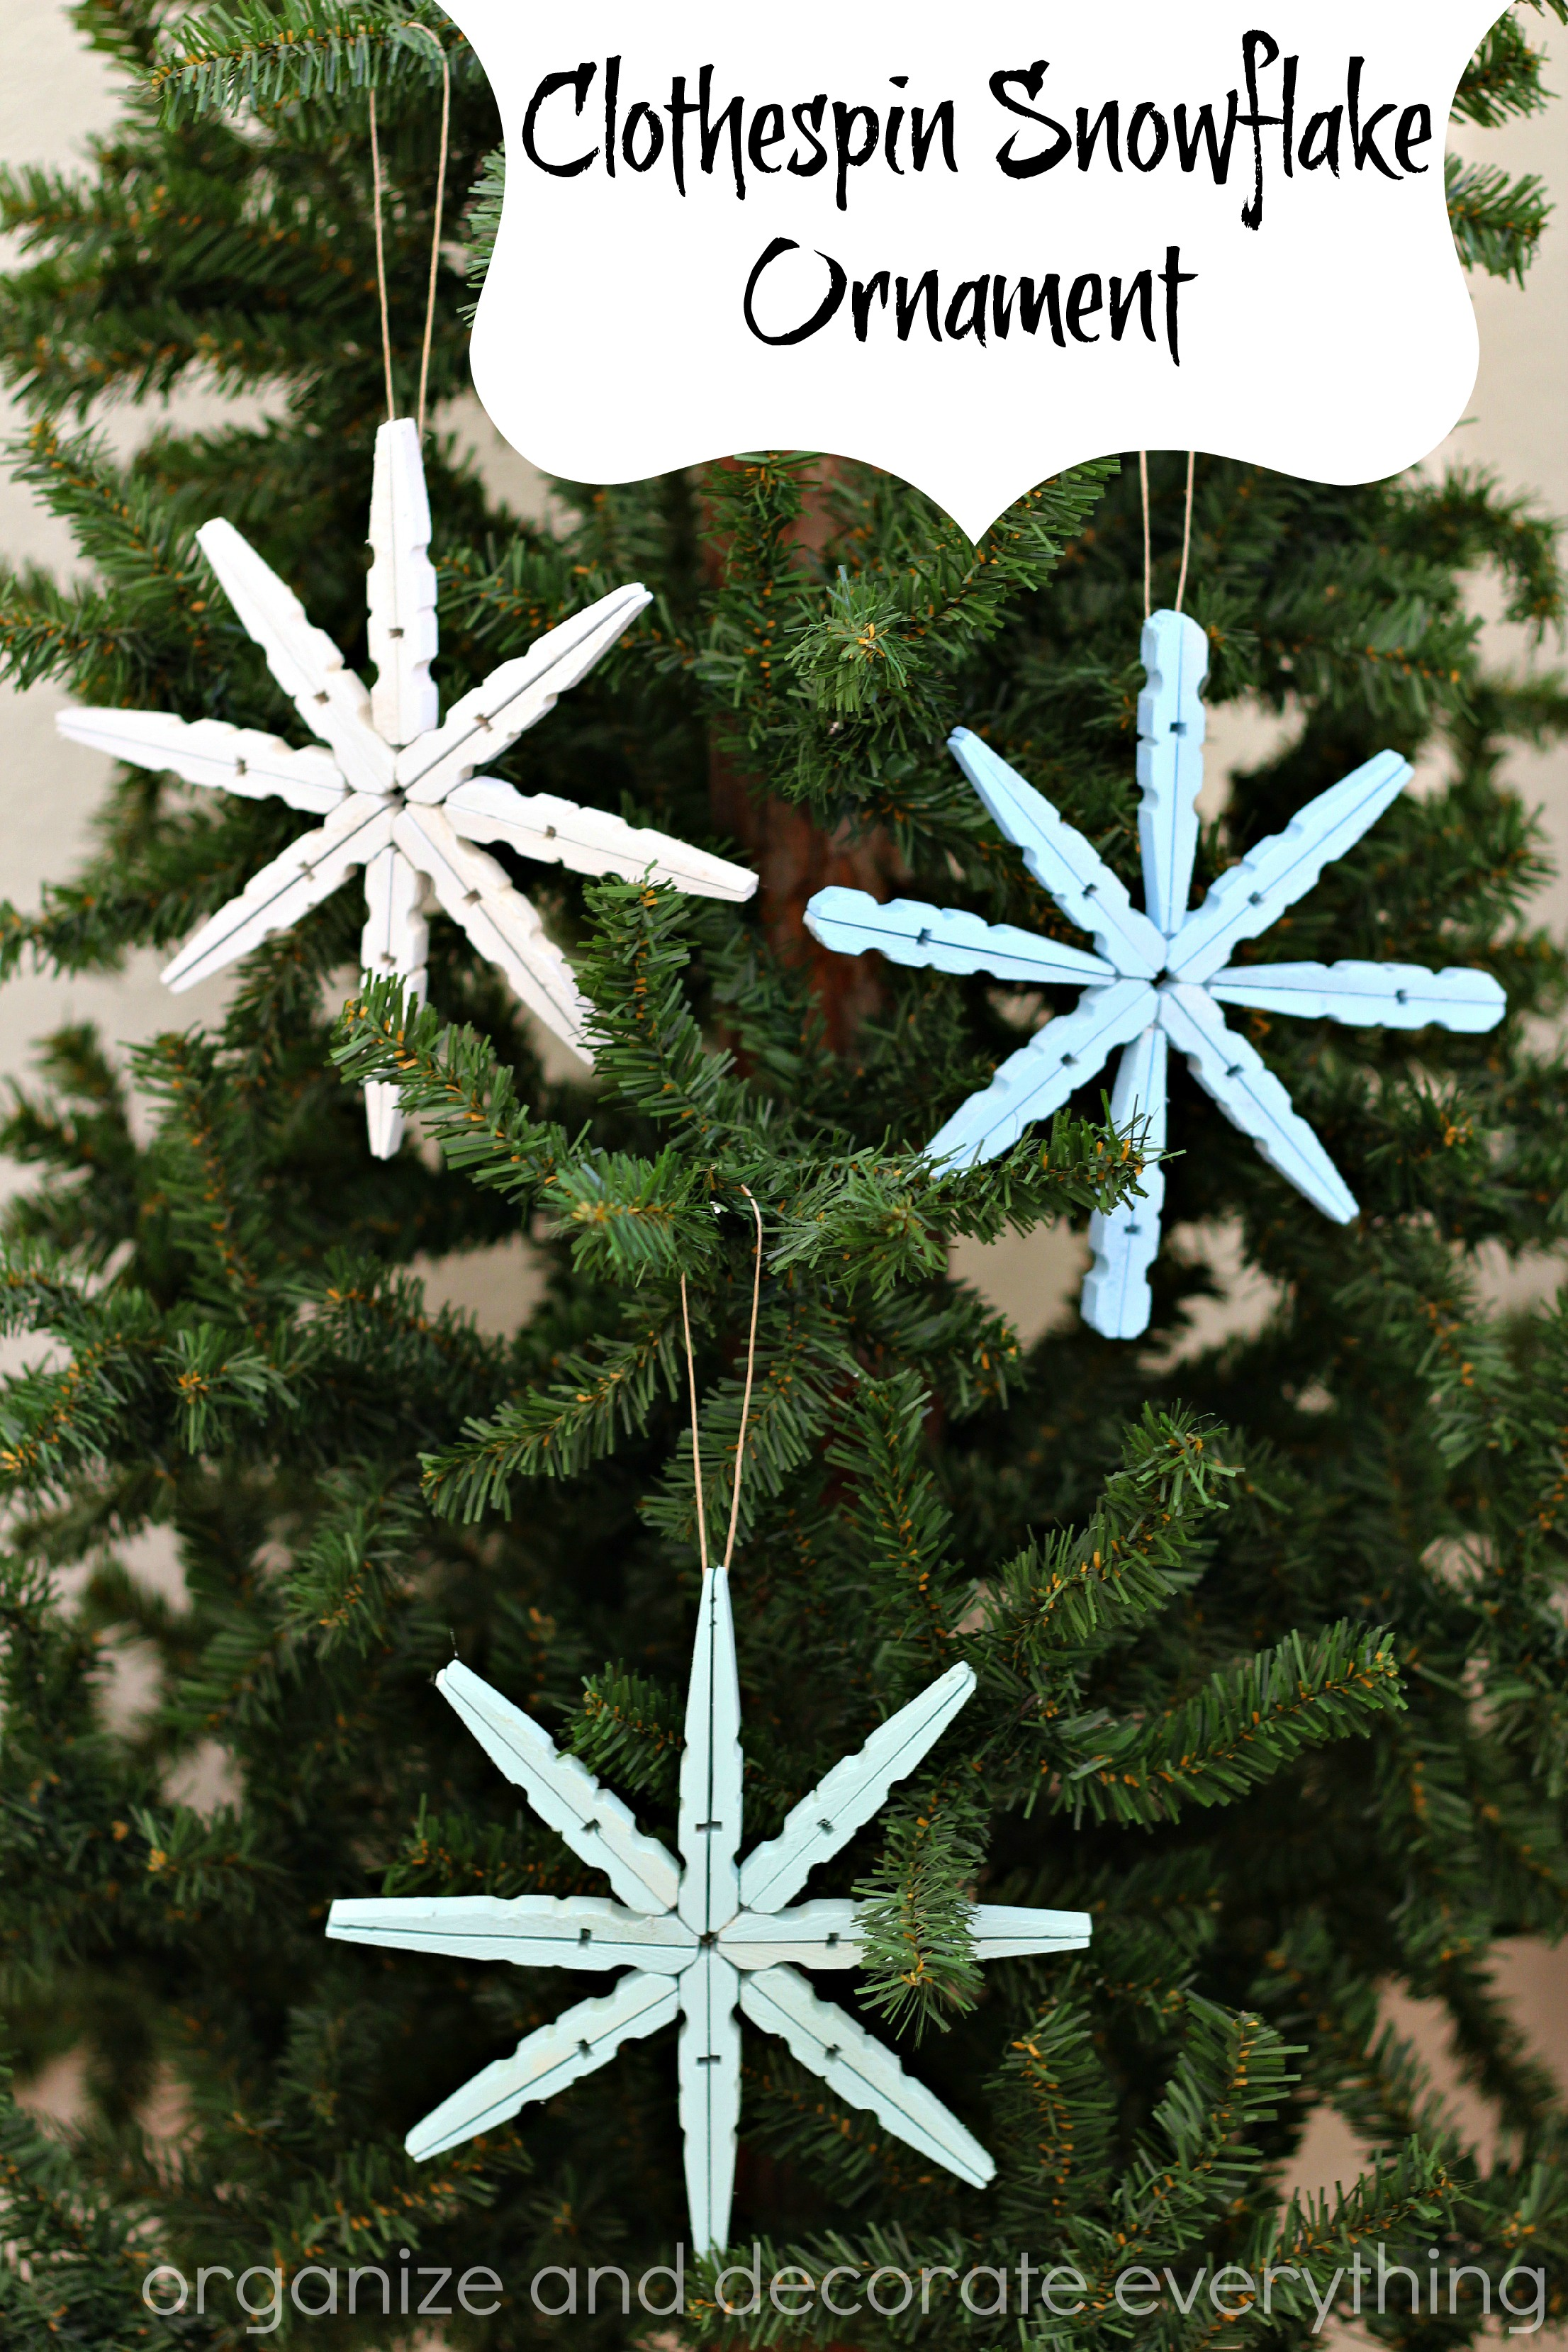 Clothespin Snowflake Ornament Tutorial - U Create